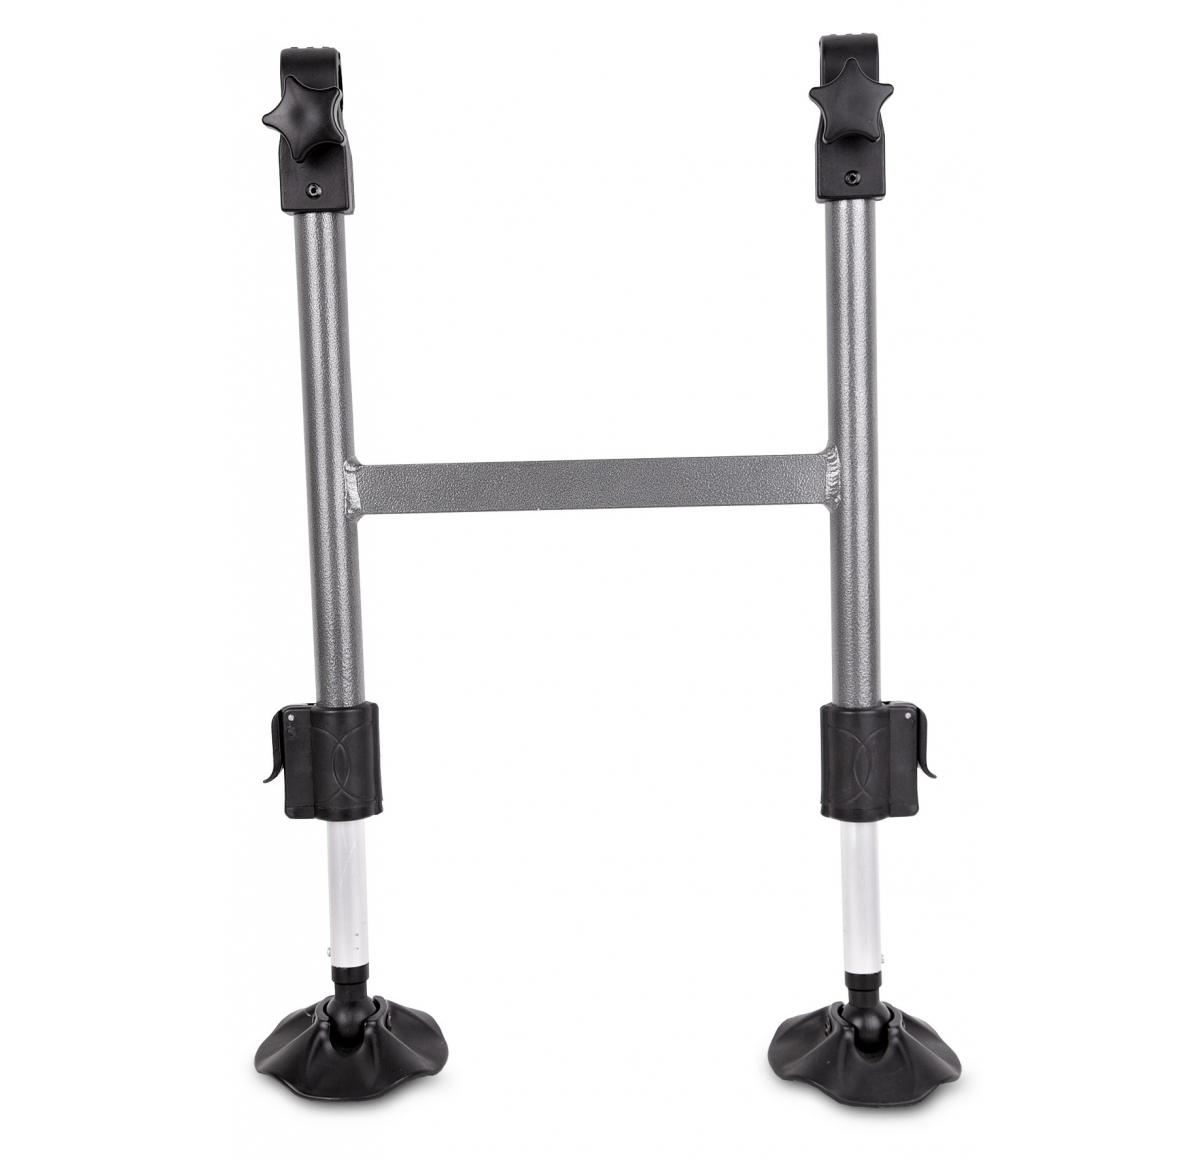 ANACONDA Double Support Leg